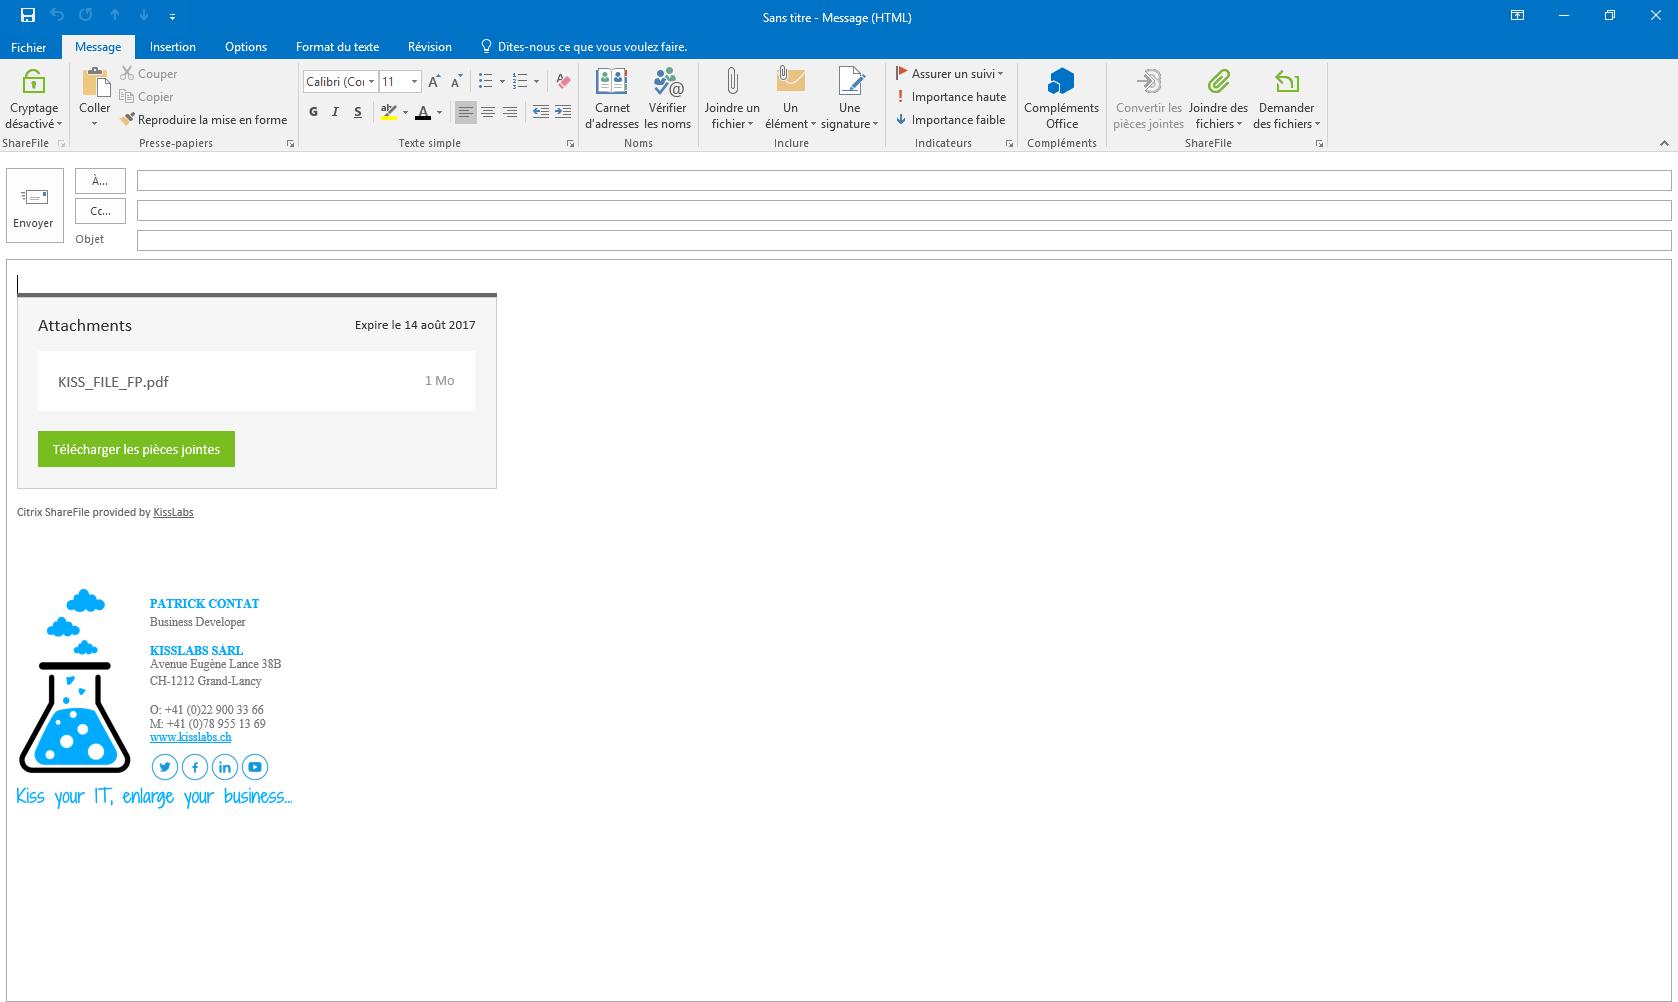 KissFile - Citrix ShareFile - Share File via Outlook